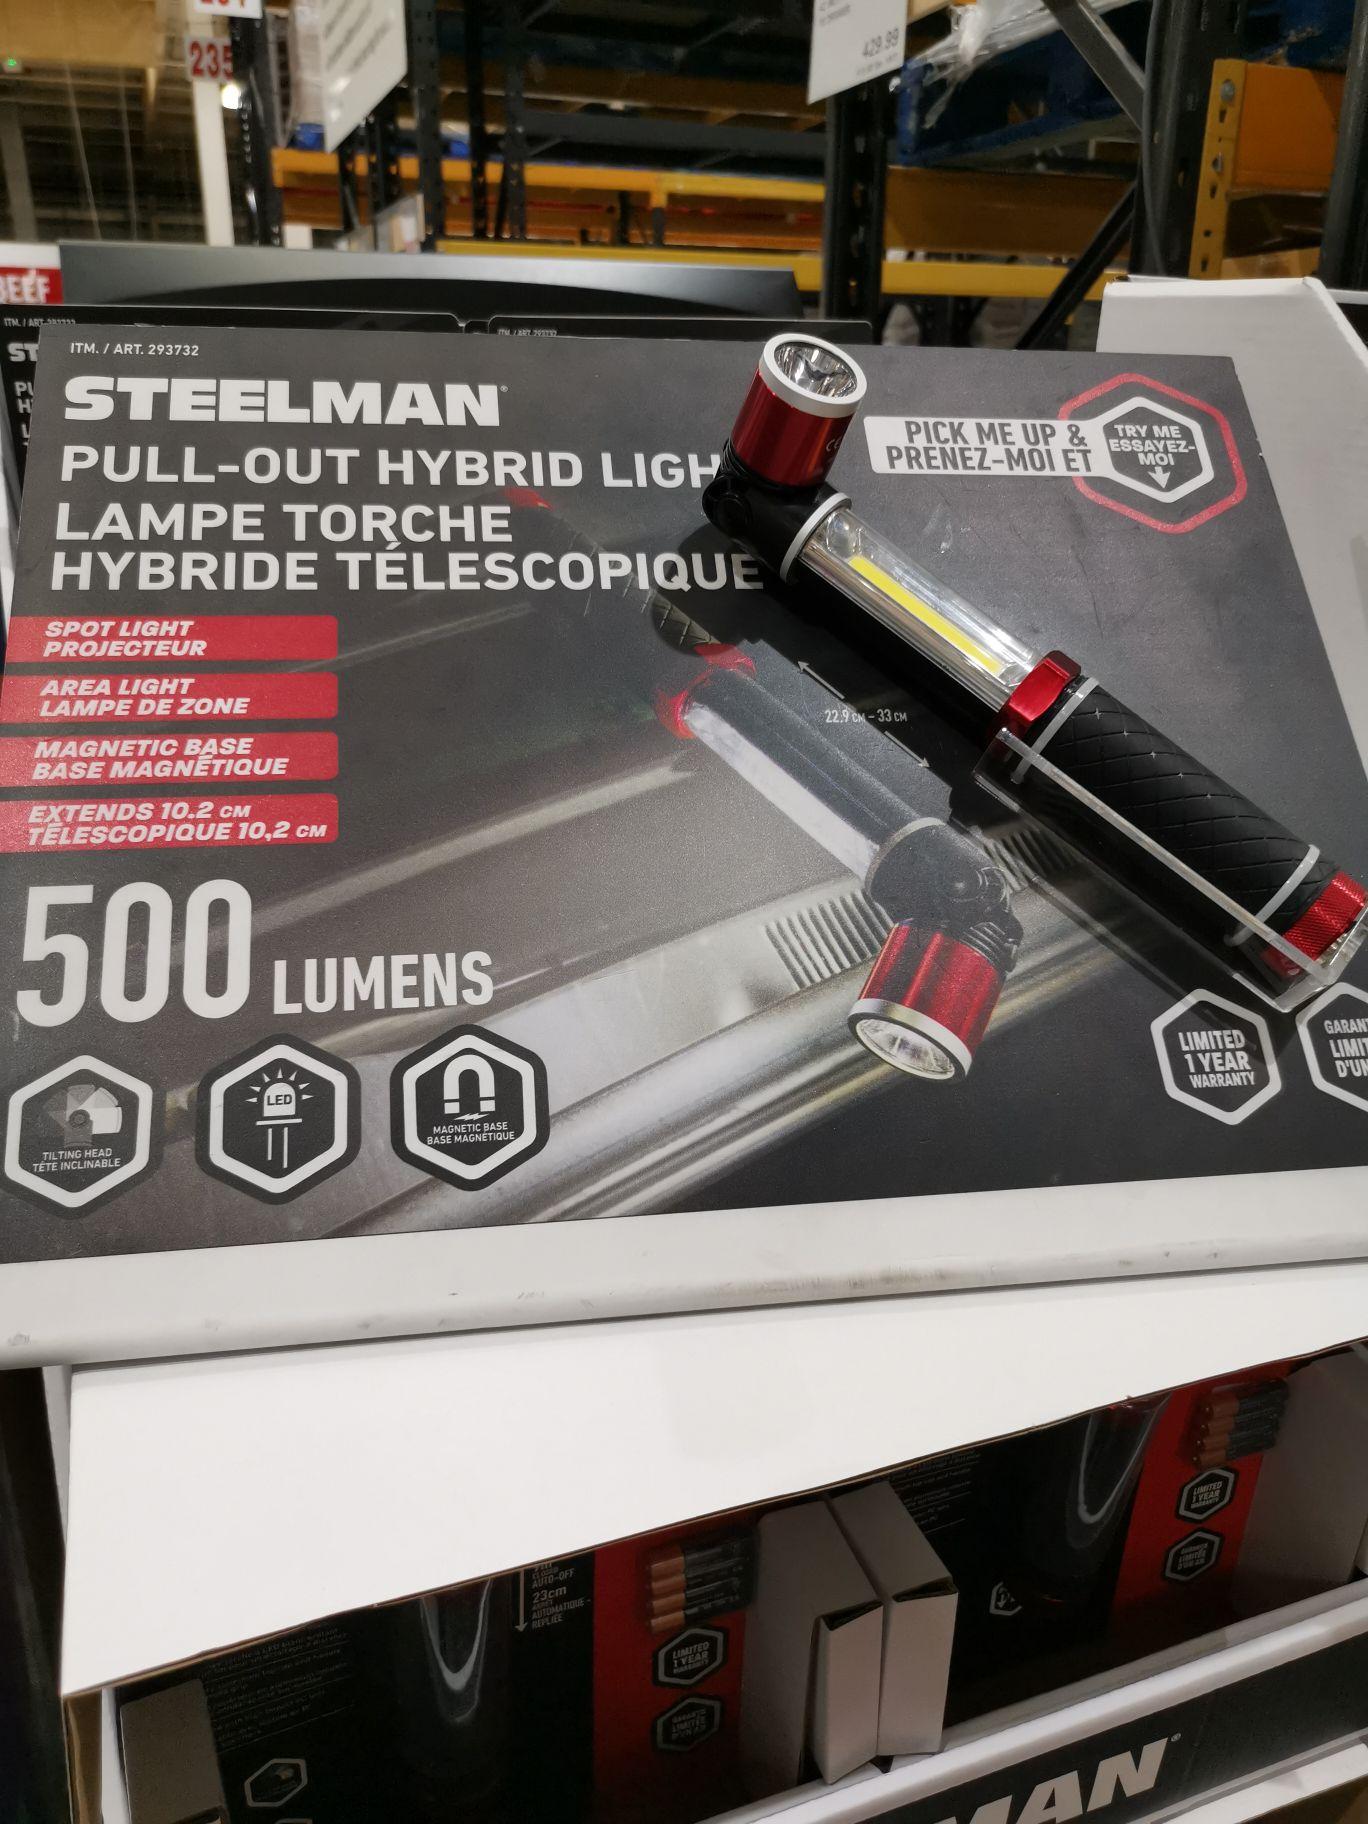 Steelman Pull-out Hybrid Light £11.99 @ Costco